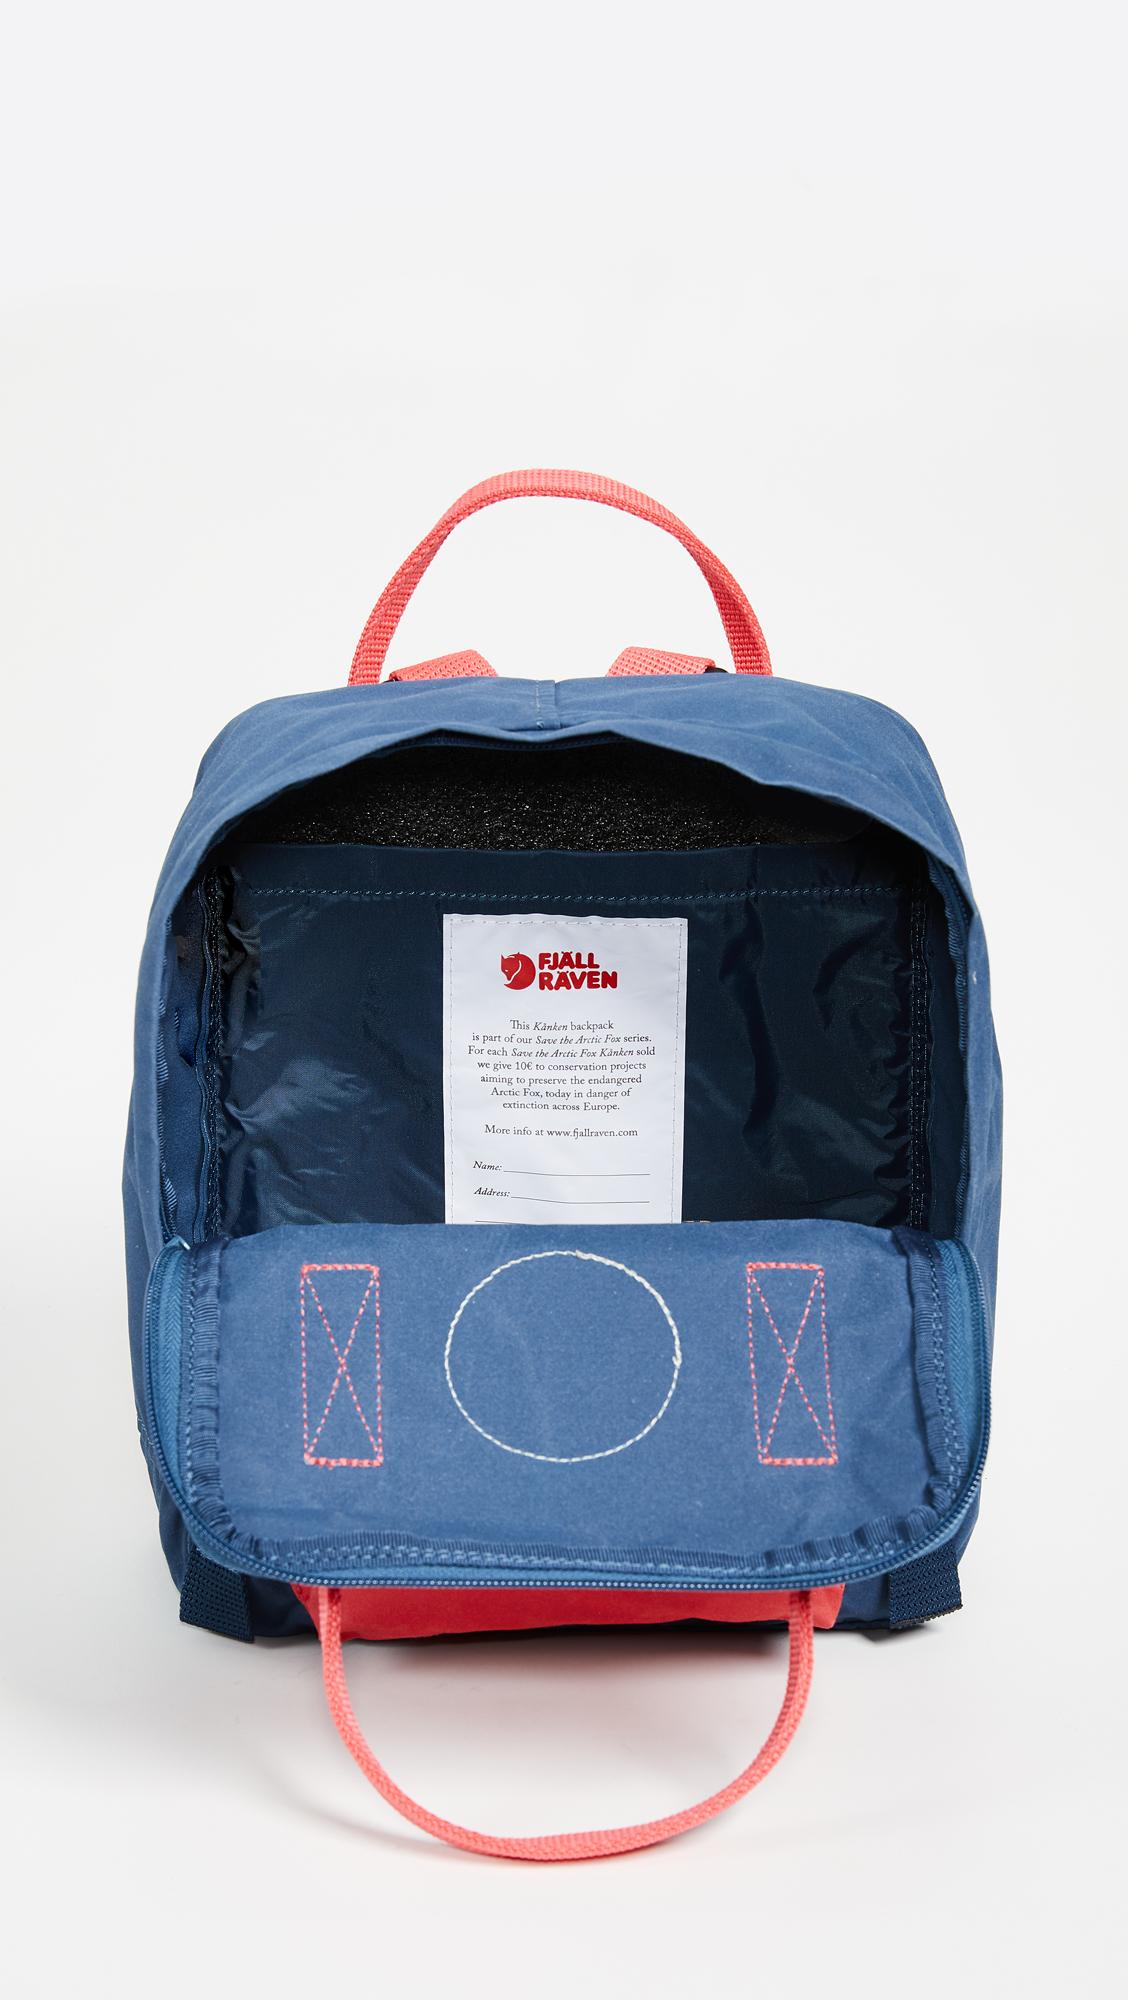 20a8cc570 Fjallraven Save the Arctic Fox Kanken Mini Backpack | SHOPBOP